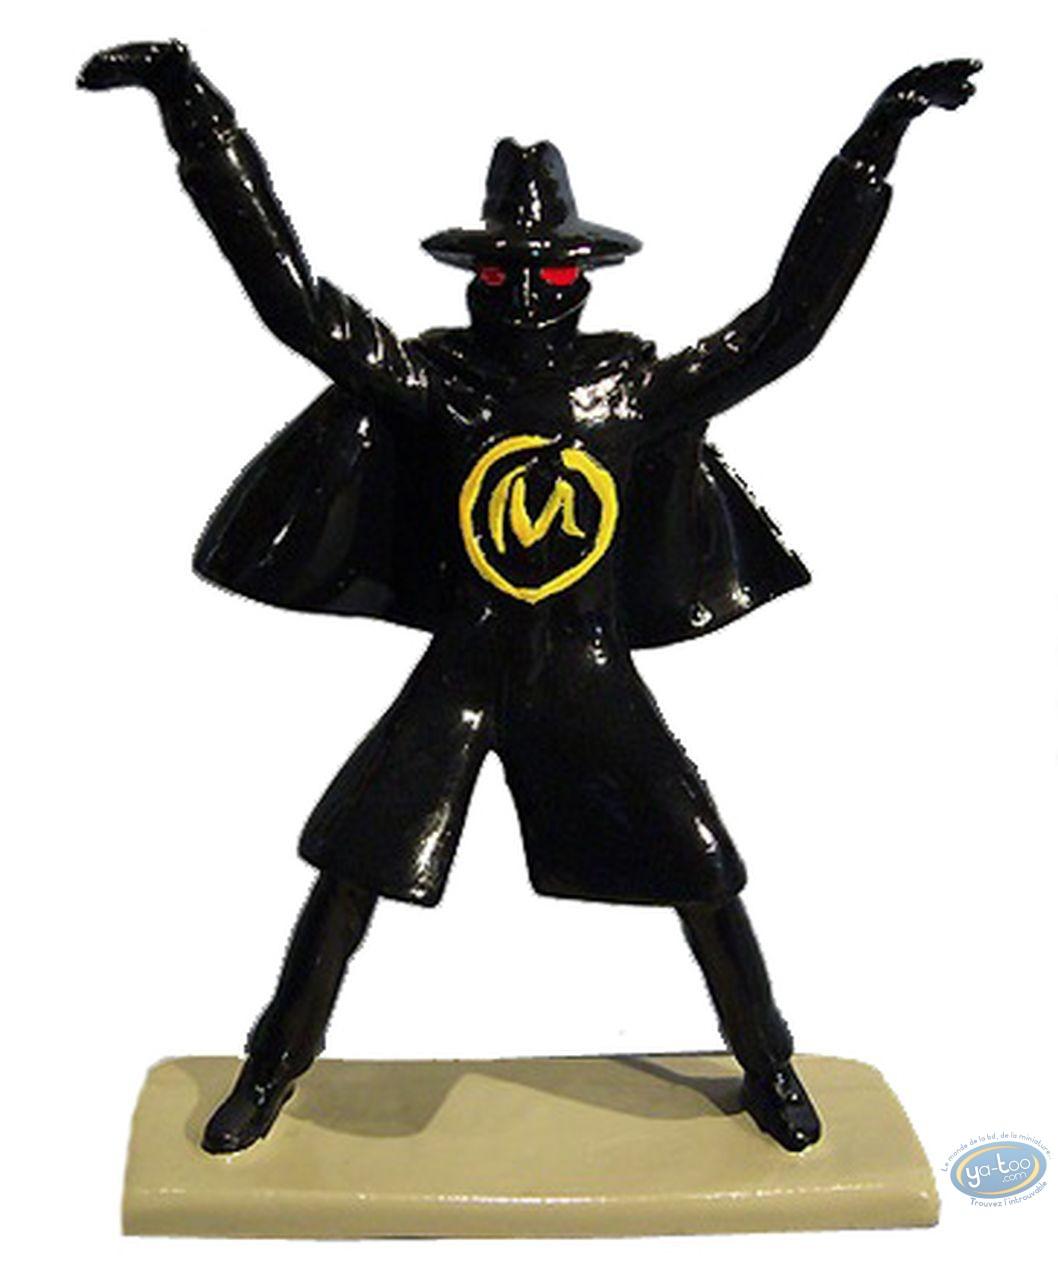 Figurine métal, Blake et Mortimer : Olrik Marque Jaune, Pixi